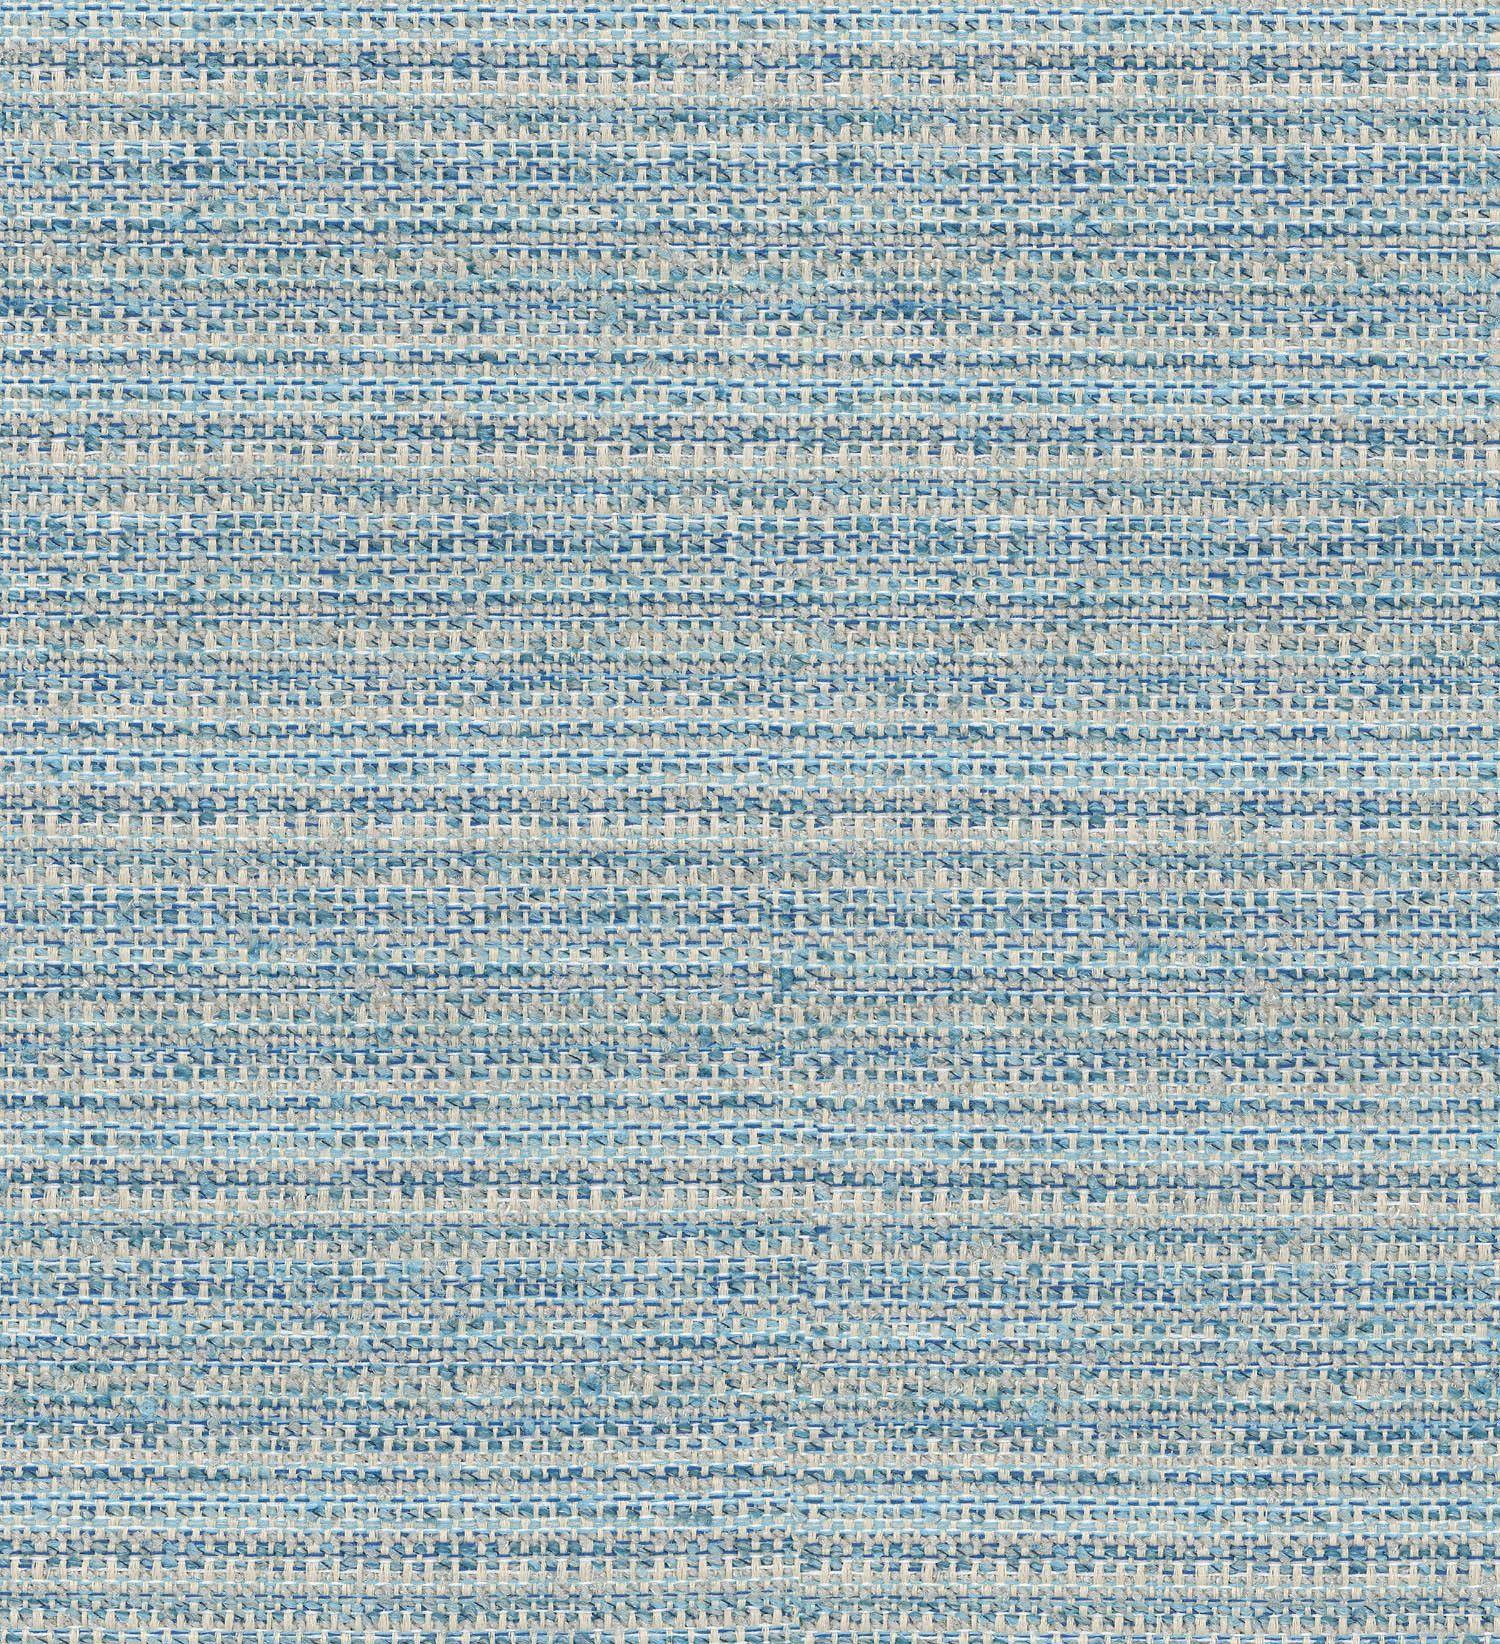 405042 Dynamo Aegean PK Lifestyles Fabric